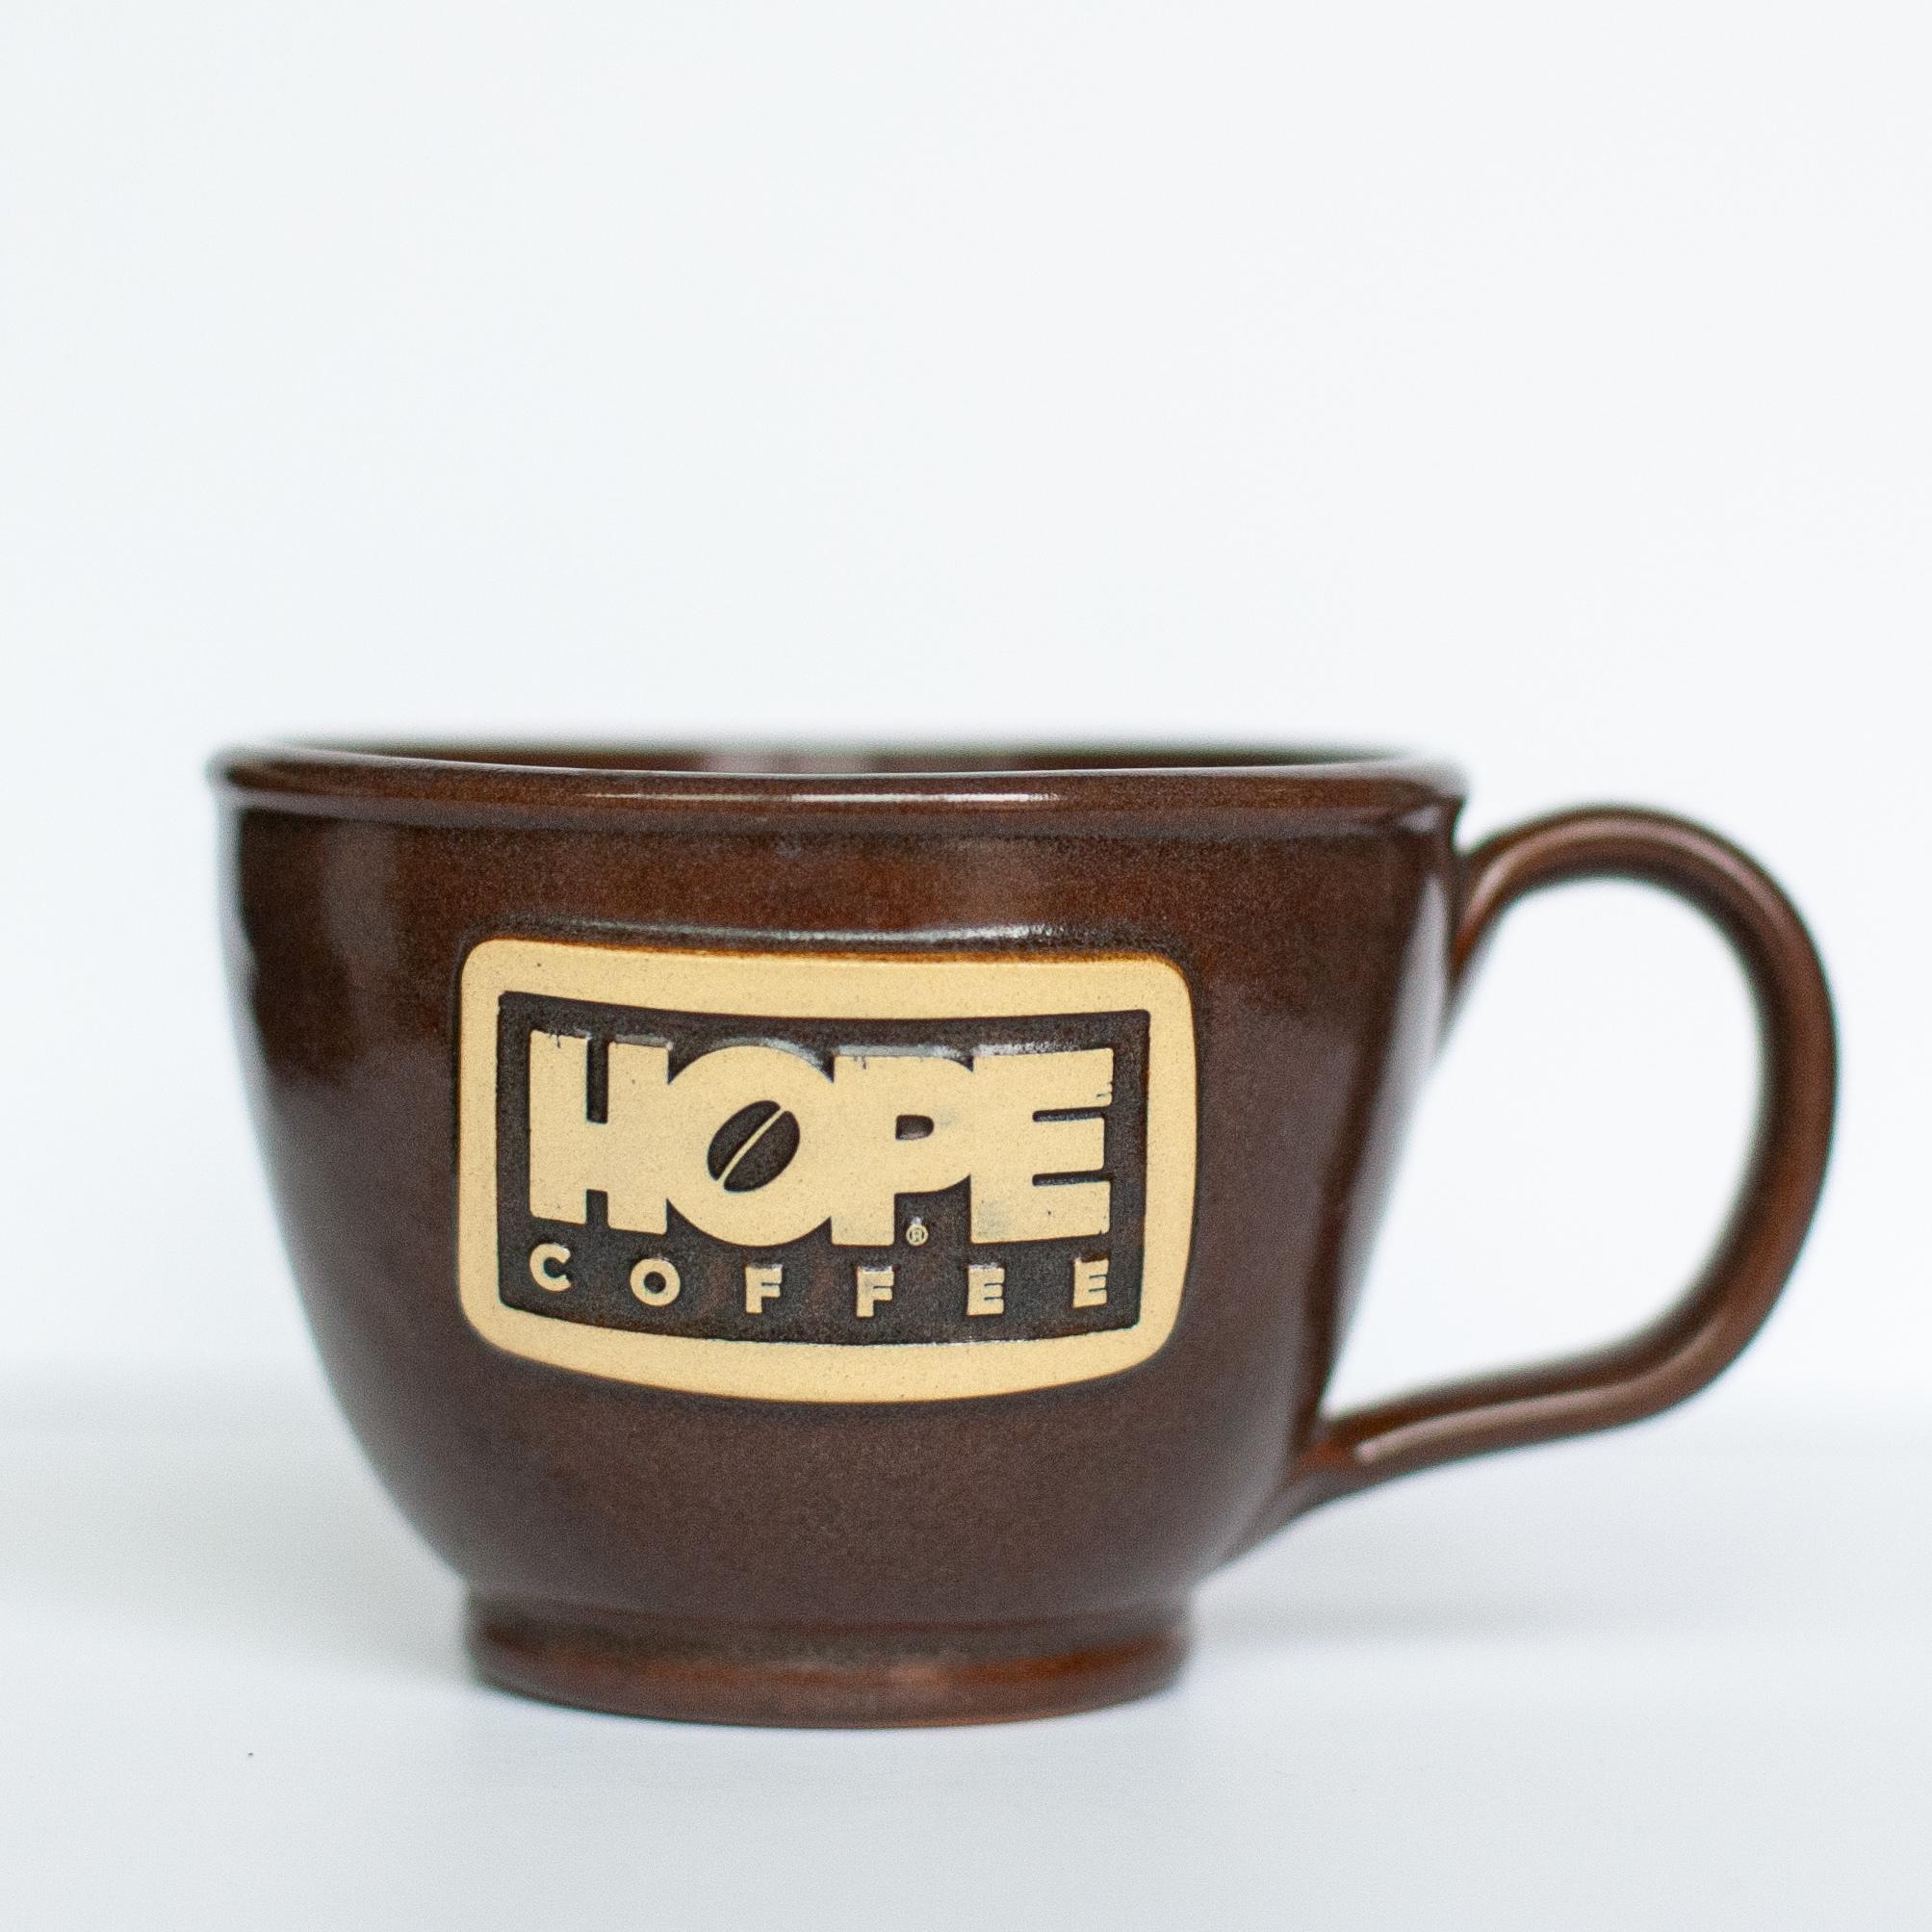 HOPE Coffee 12 oz Handcrafted Stoneware French Latte Mug 20026